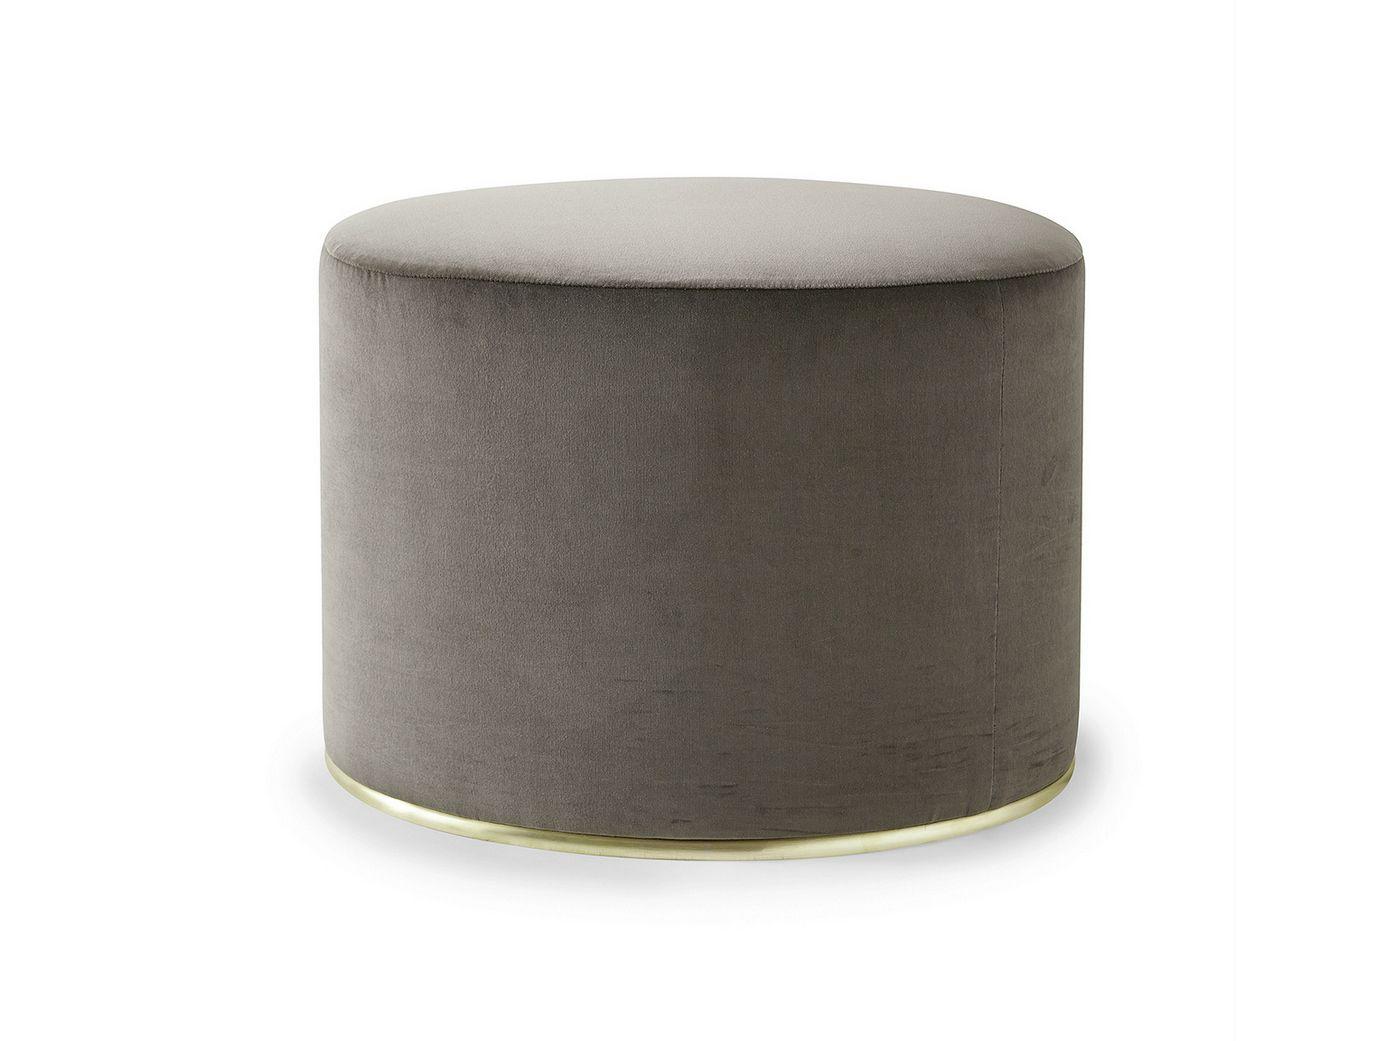 upholstered velvet pouf lou by gallotti radice design studio g r. Black Bedroom Furniture Sets. Home Design Ideas